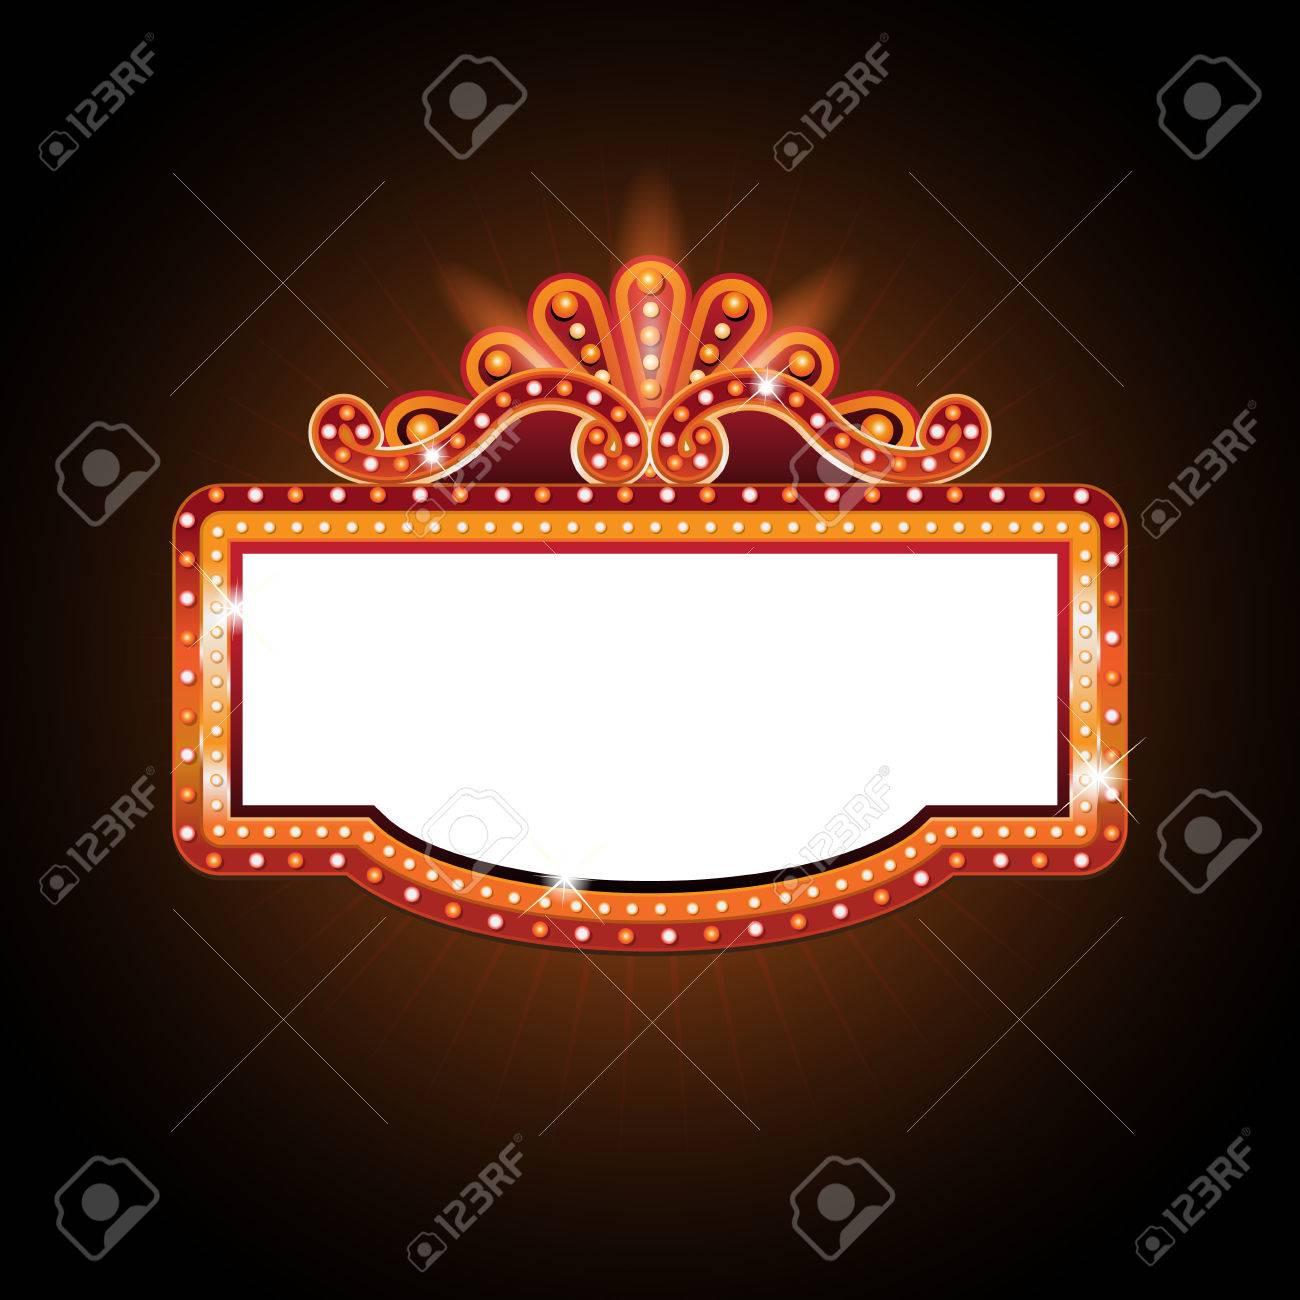 Brightly theater glowing retro cinema neon sign - 74641176